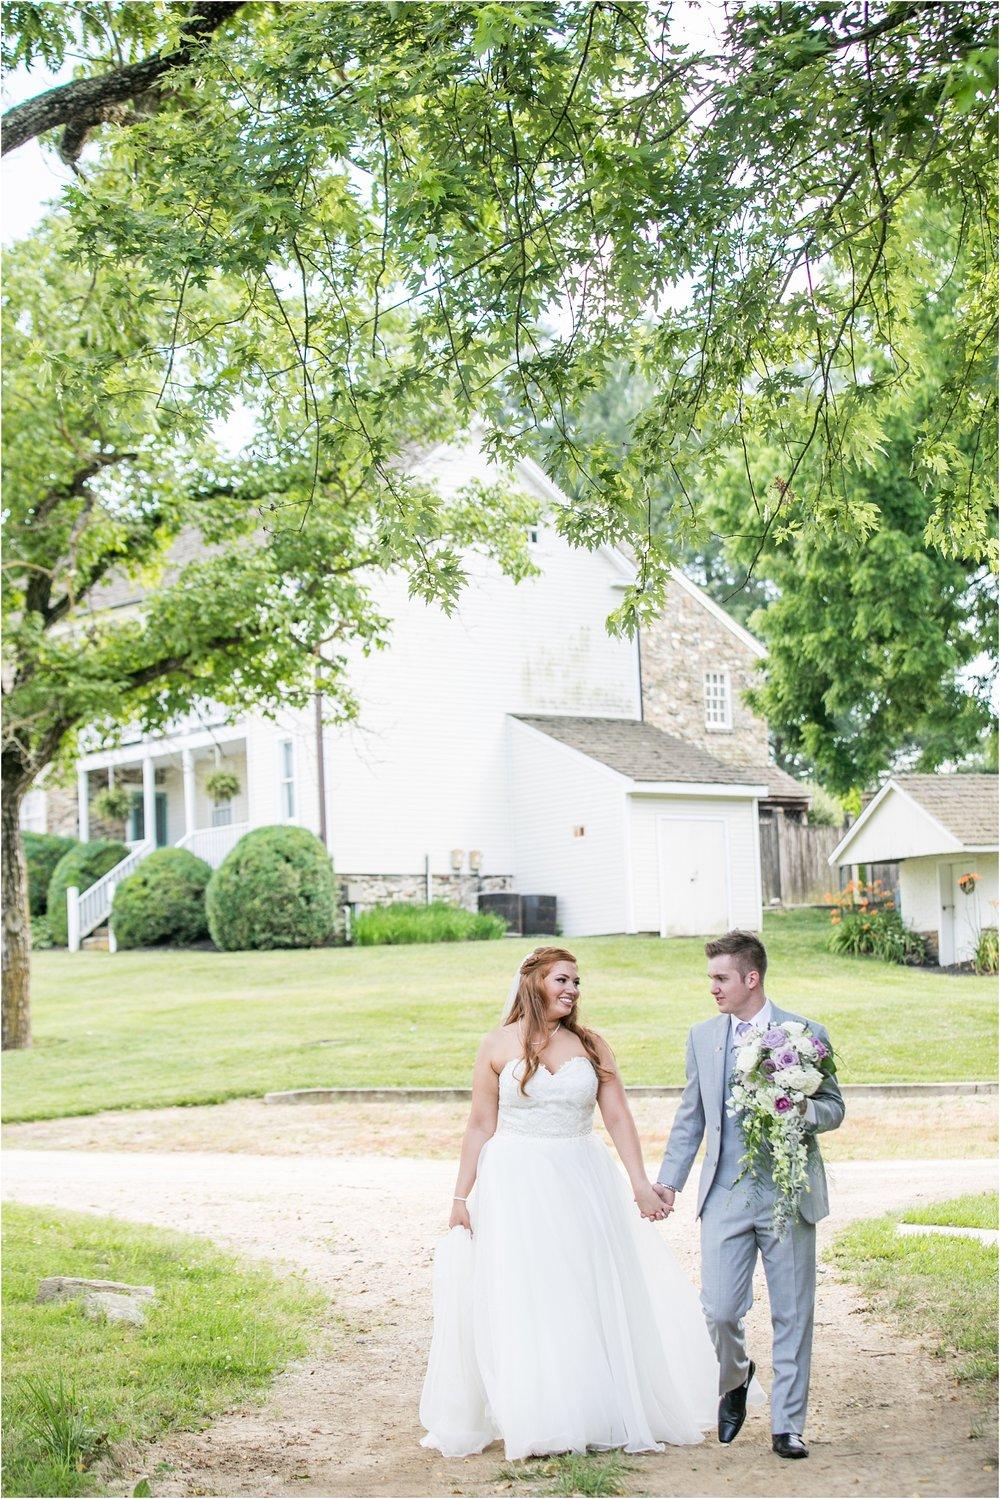 Lumley Stone Manor Wedding Living Radiant Photography photos_0151.jpg